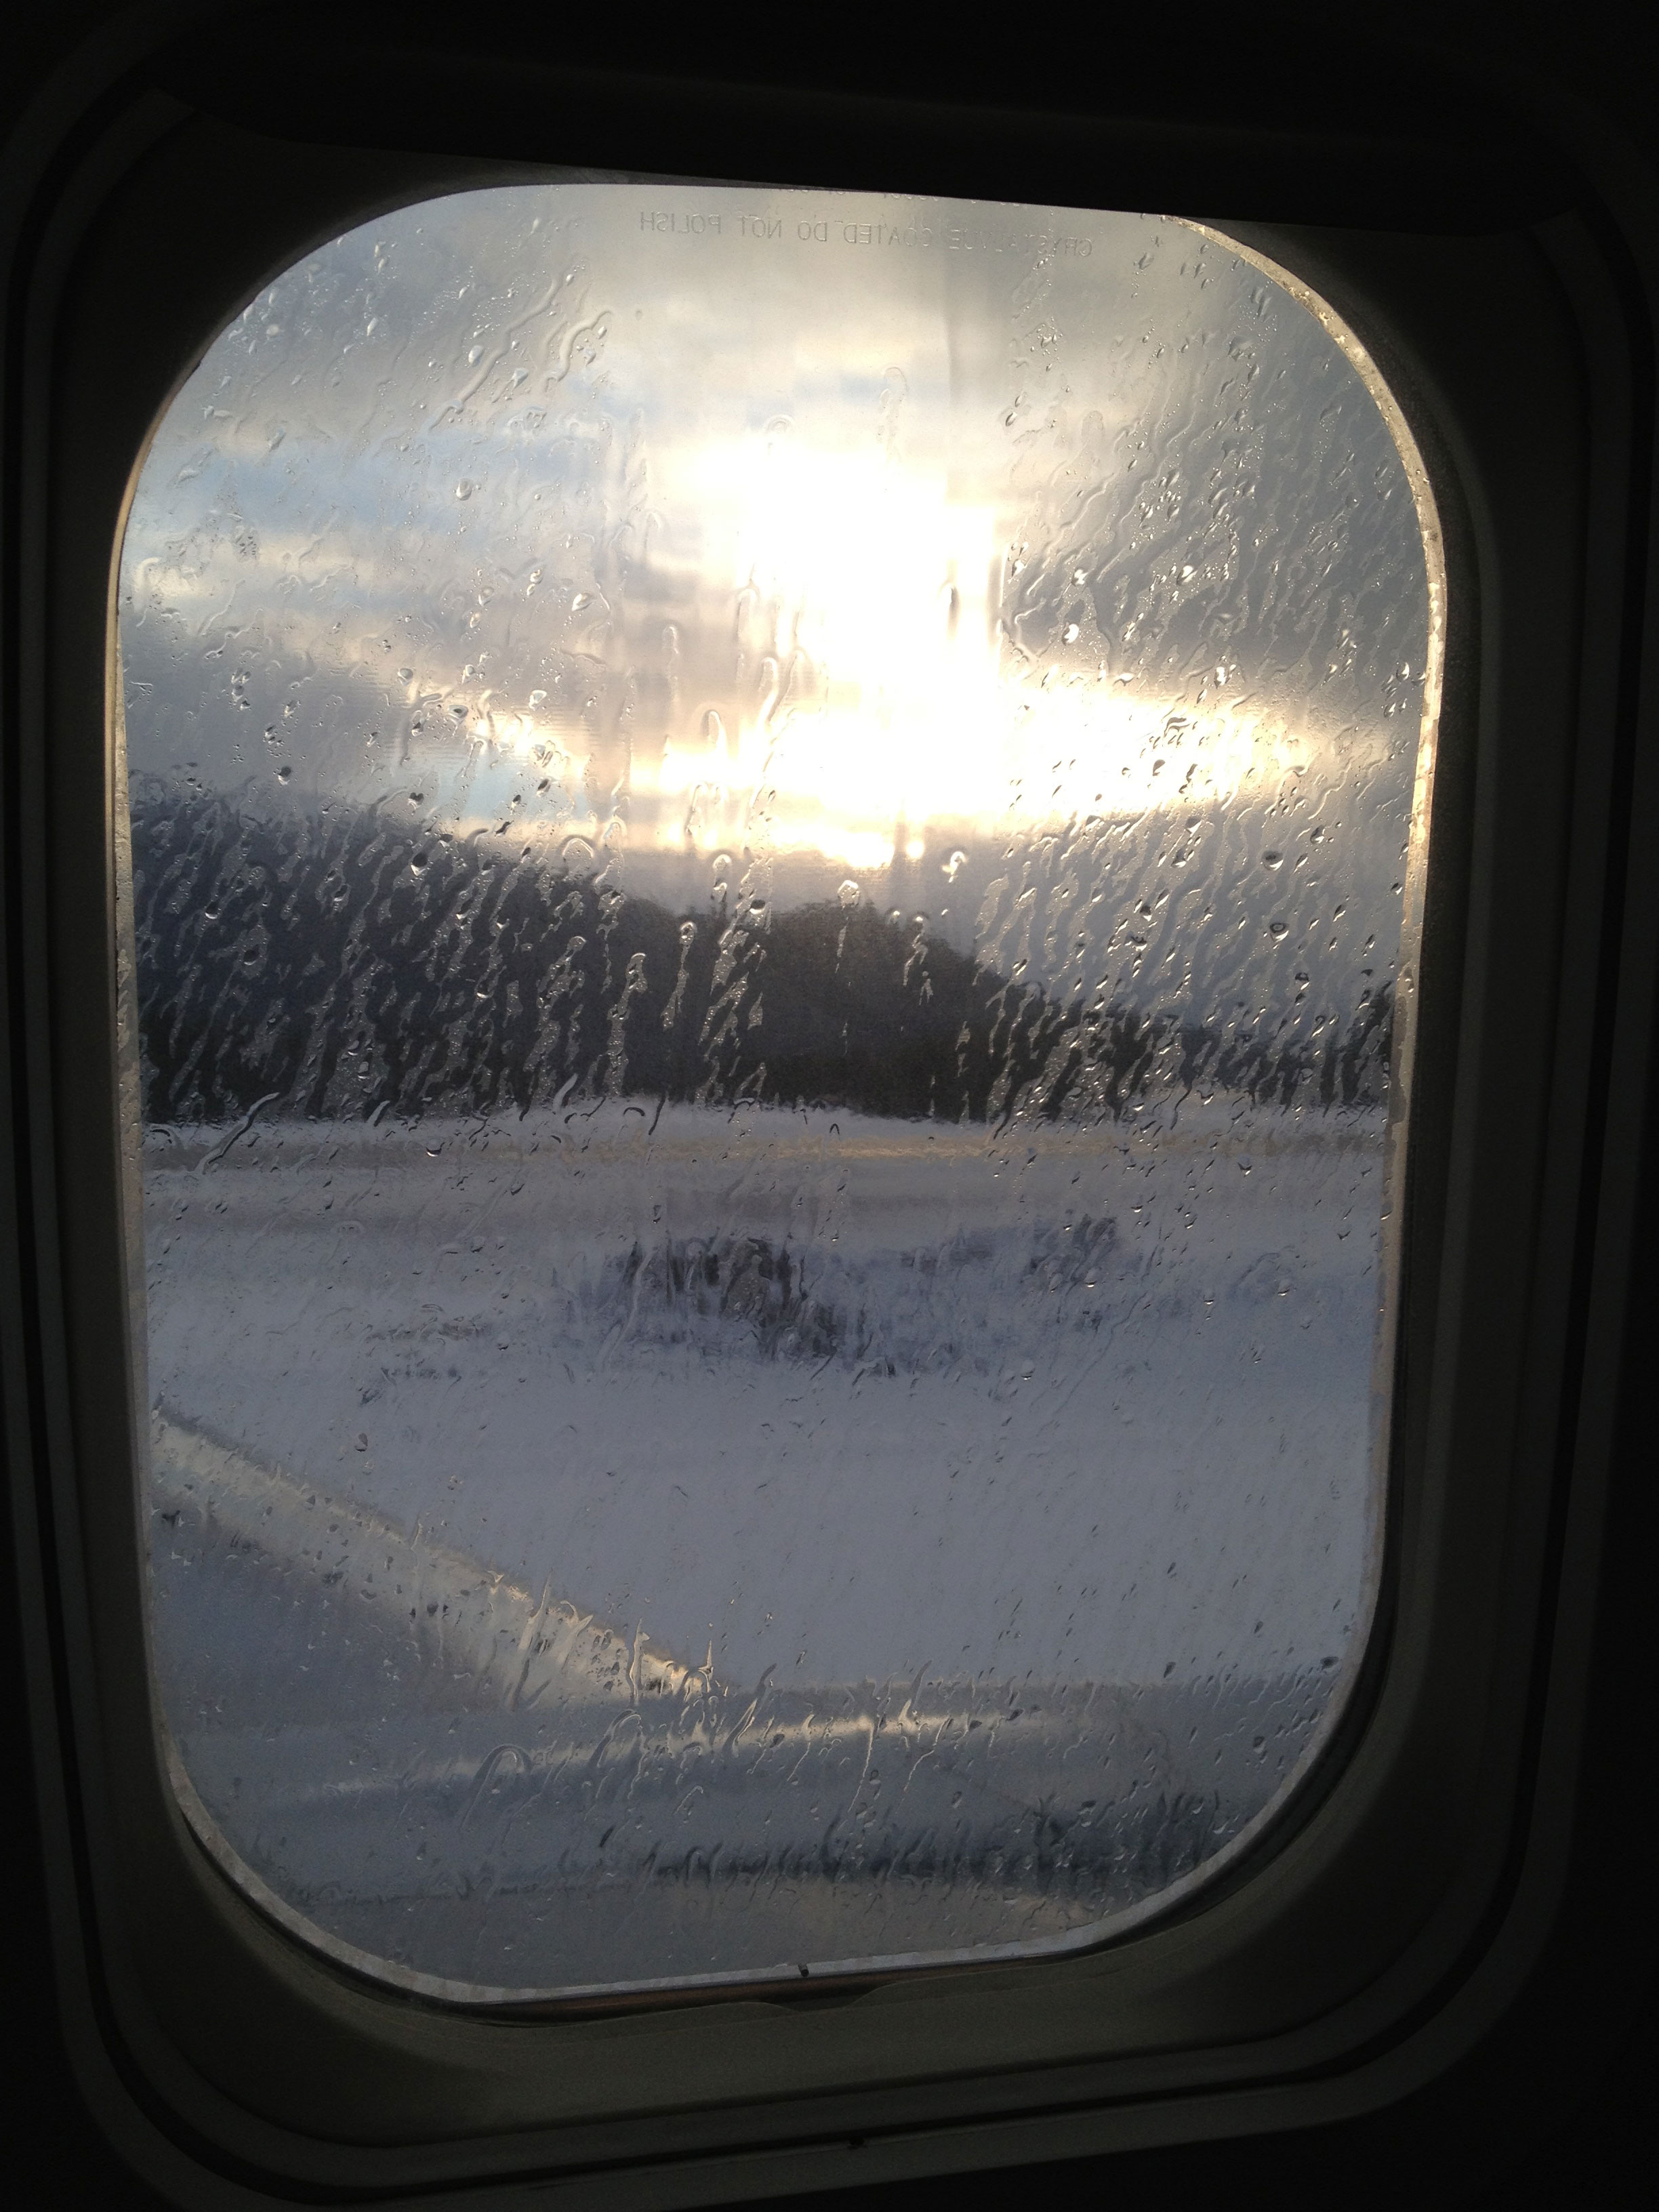 It never fails. The moment I depart rainy Juneau, the sun starts shining!